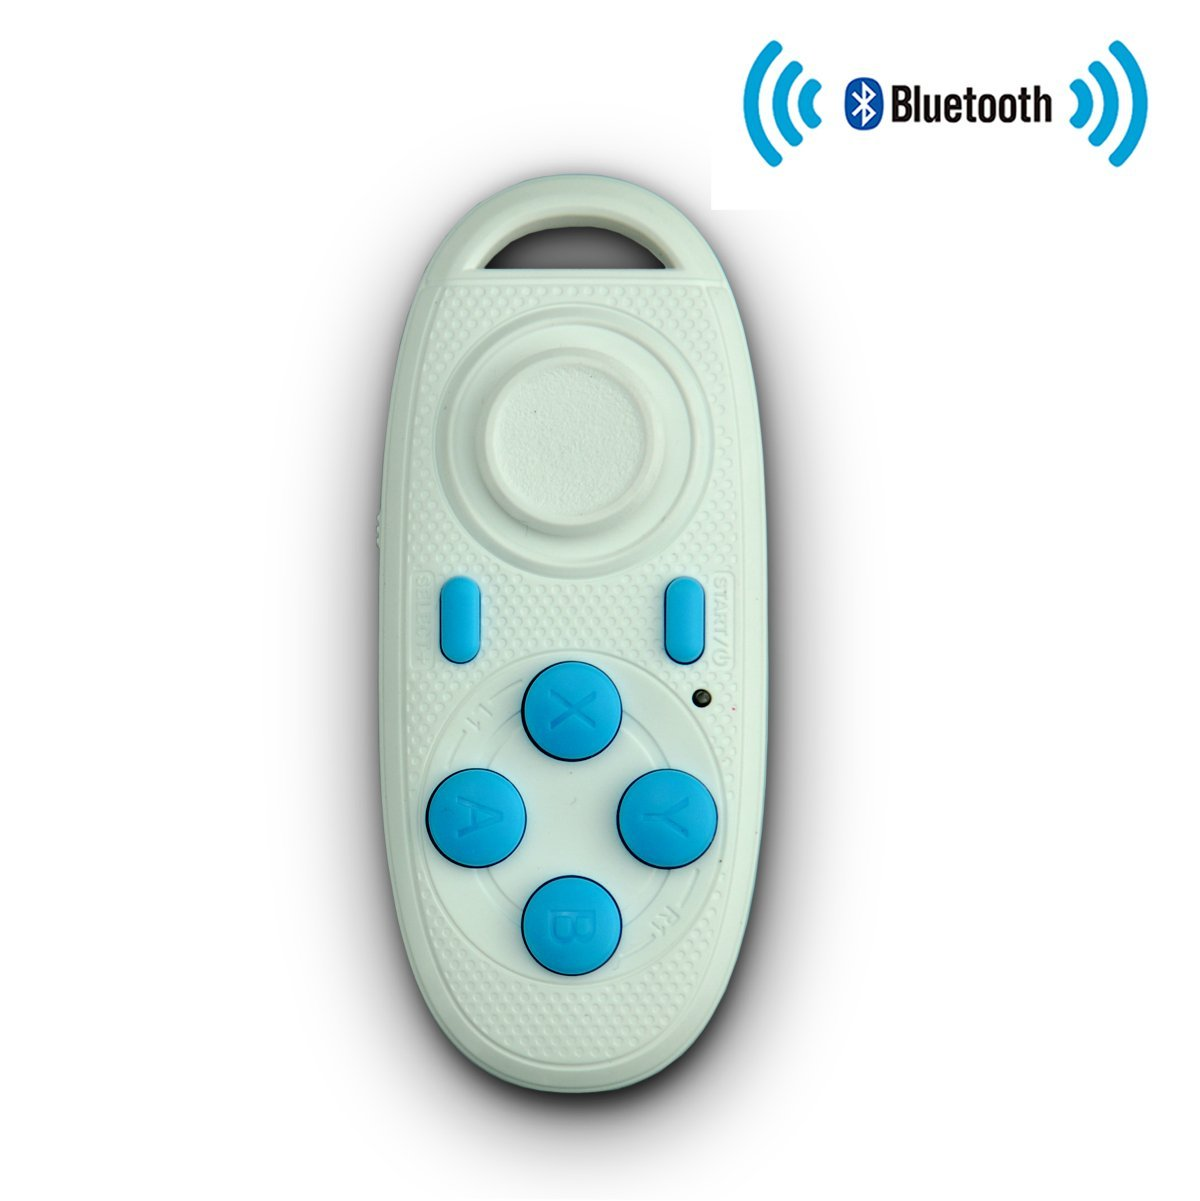 71b1bedcbafb SUNNYPEAK Wireless Bluetooth Android Gamepad Bluetooth Remote Controller  for Google Cardboard VR Headset 3D Glasses Selfie